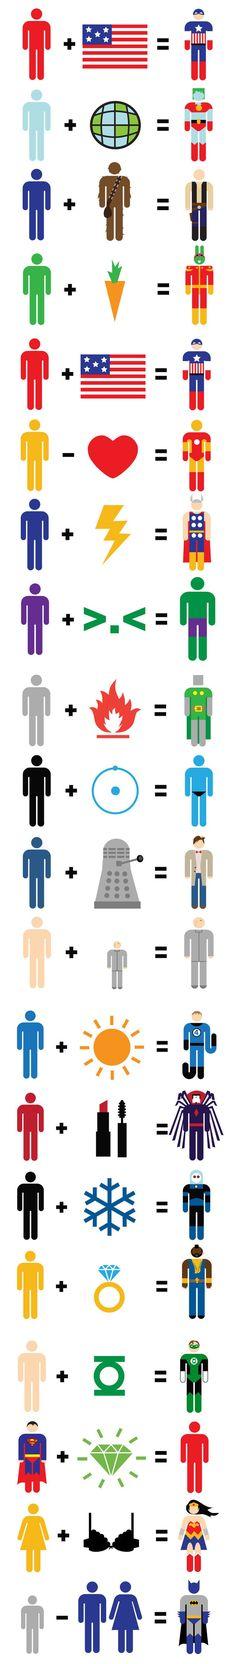 Do The Math de Matt Cowan - Les mathématiques des super-héros